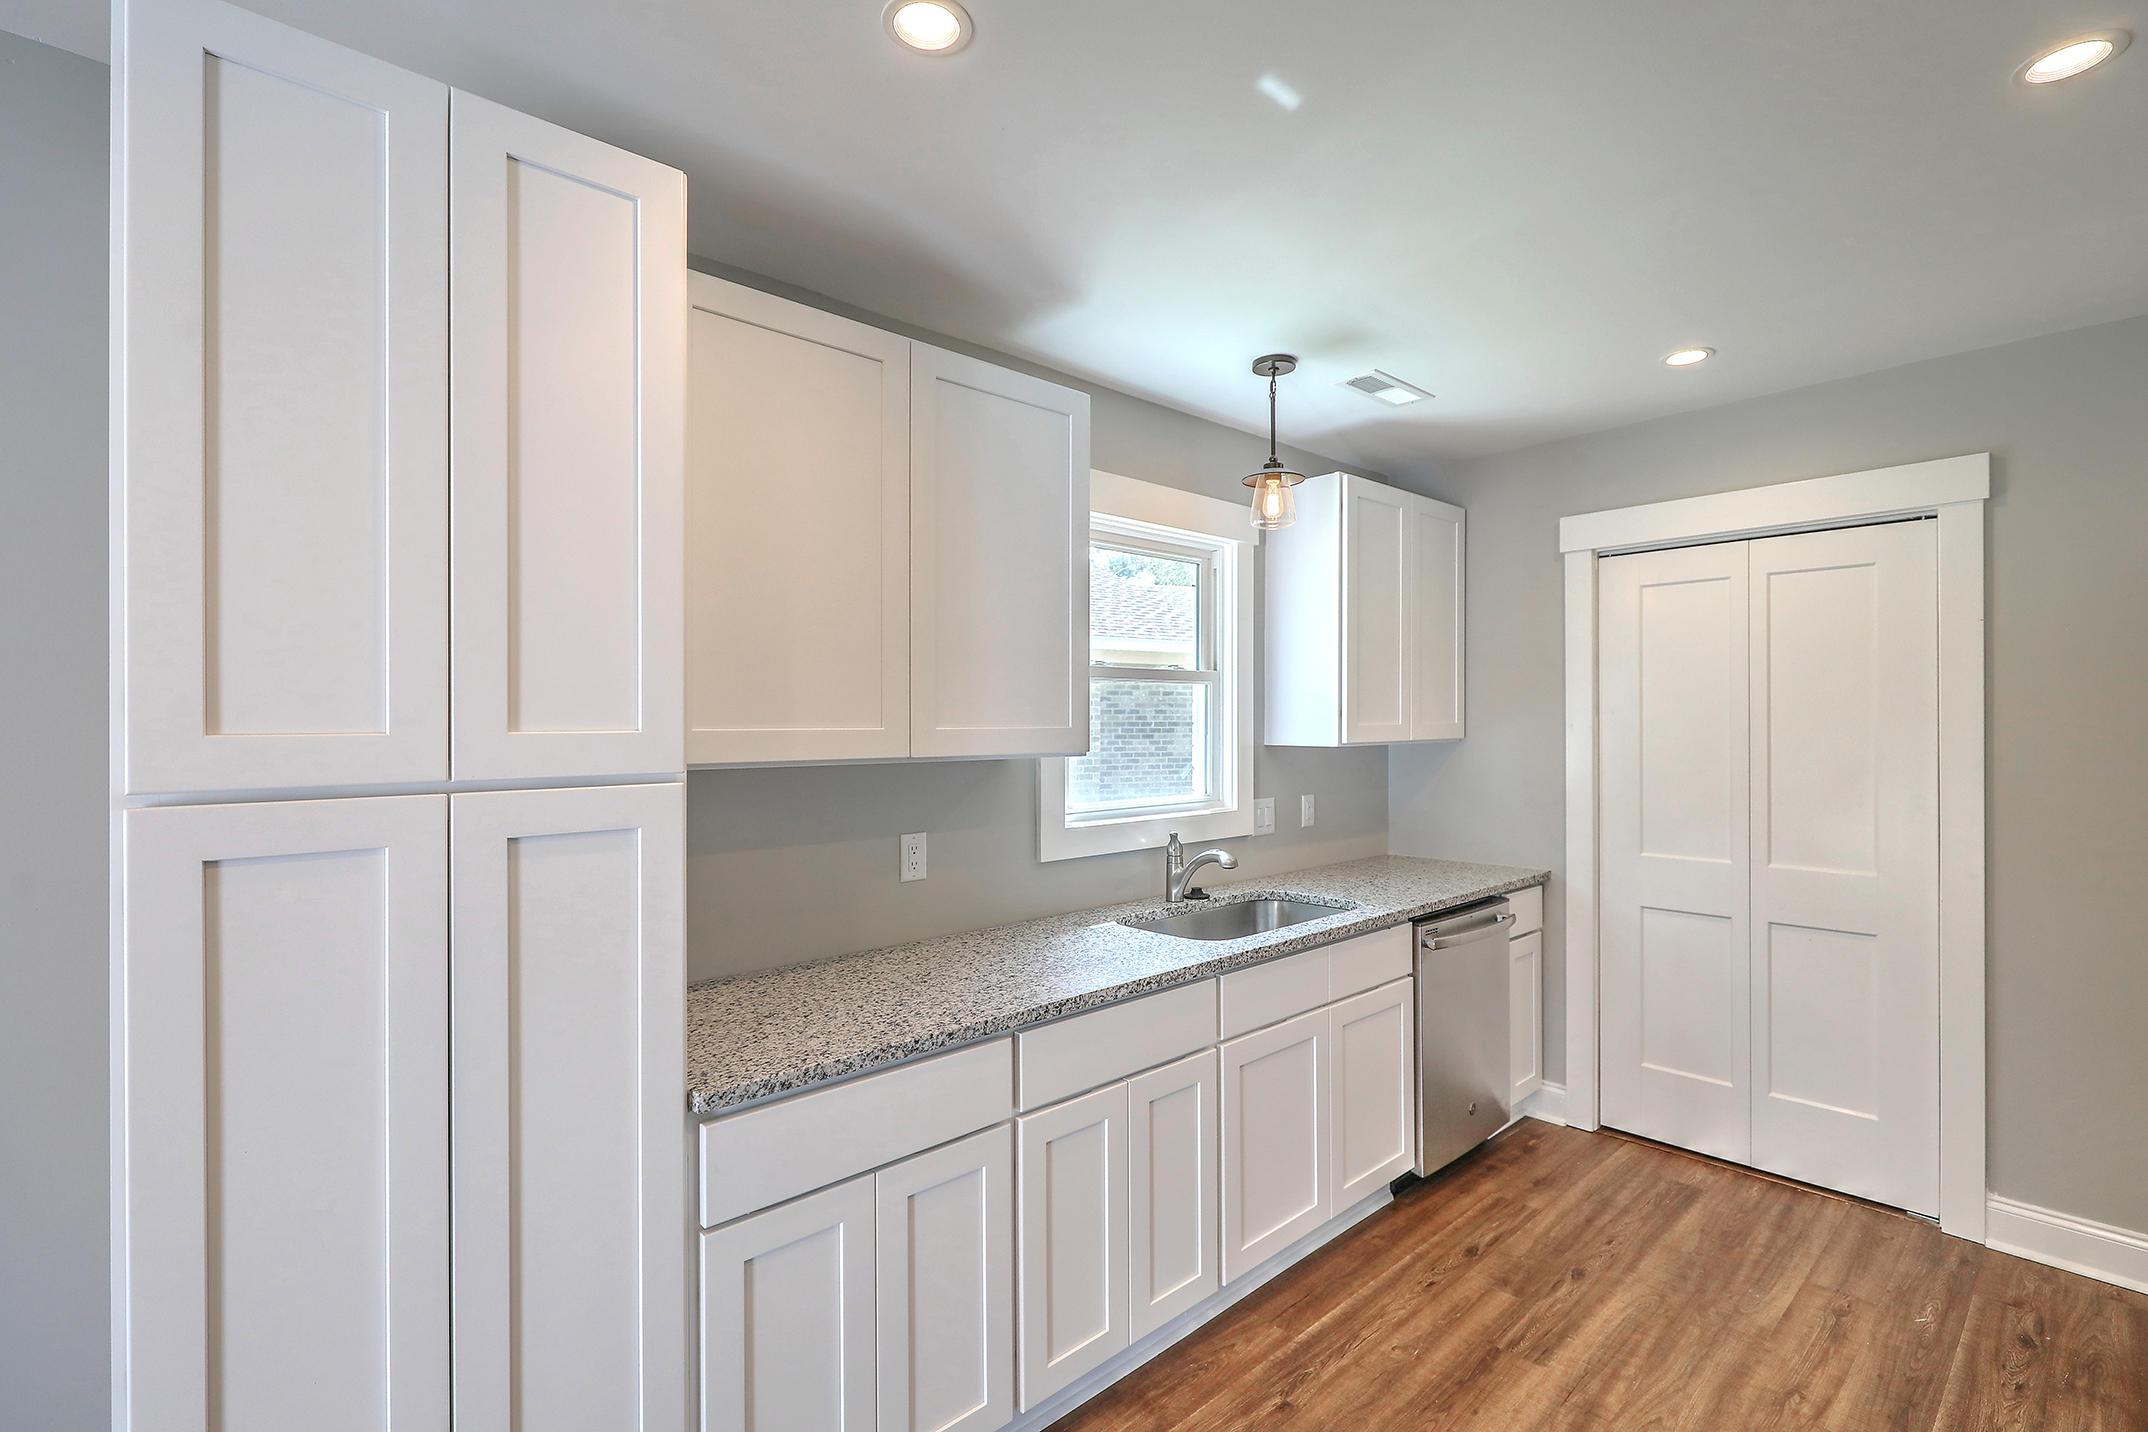 Bruno Acres Homes For Sale - 1674 Durkee, Charleston, SC - 8